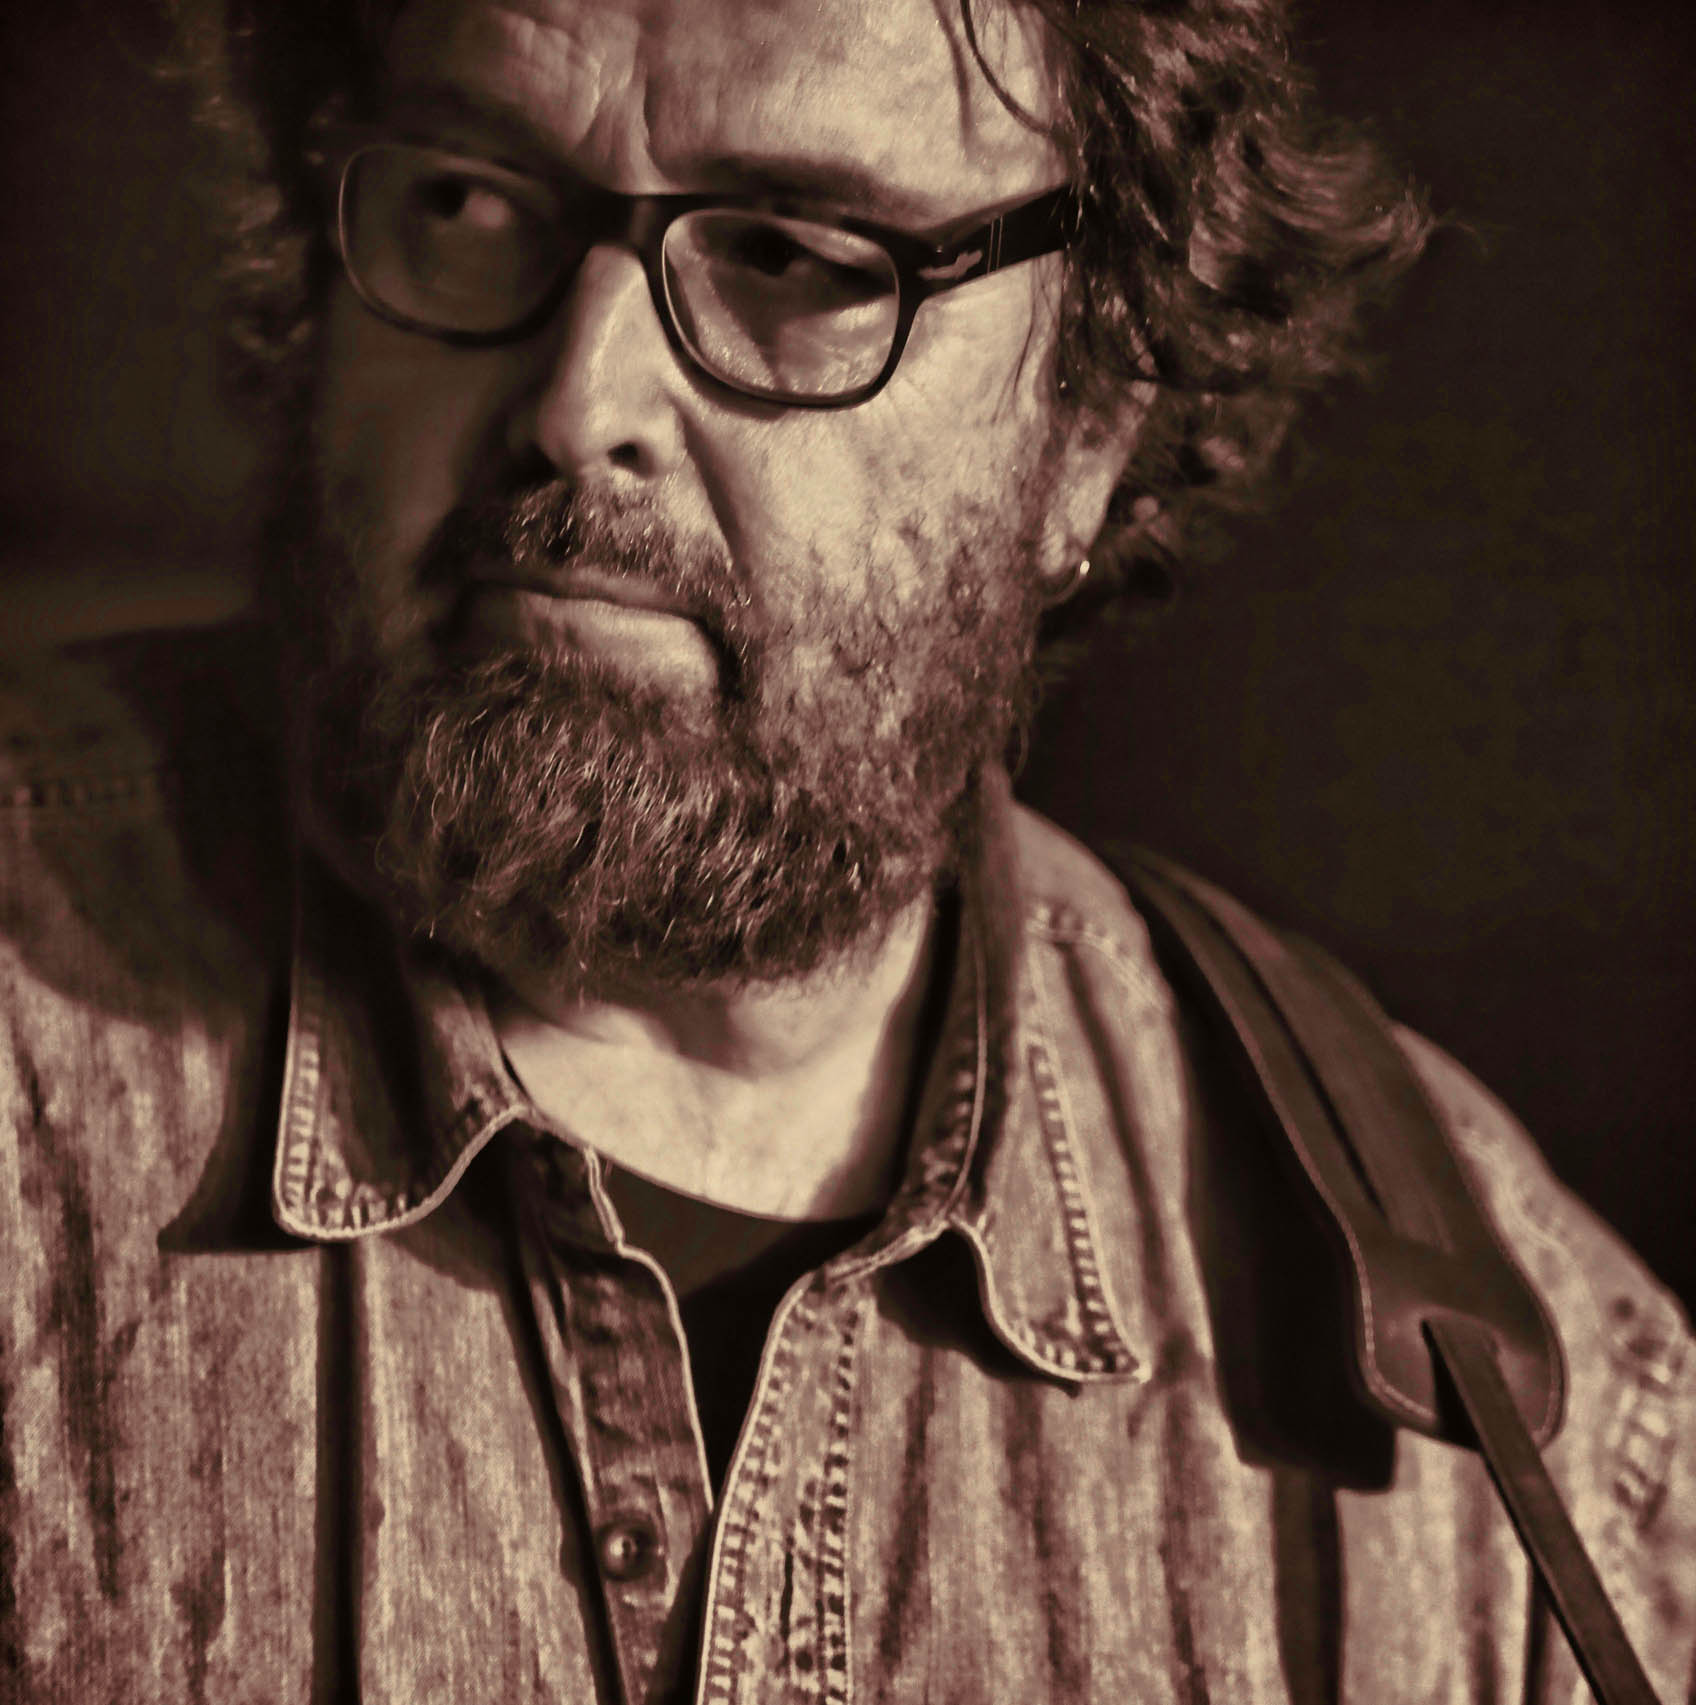 Brian Jantzi & The Lost Mariachis